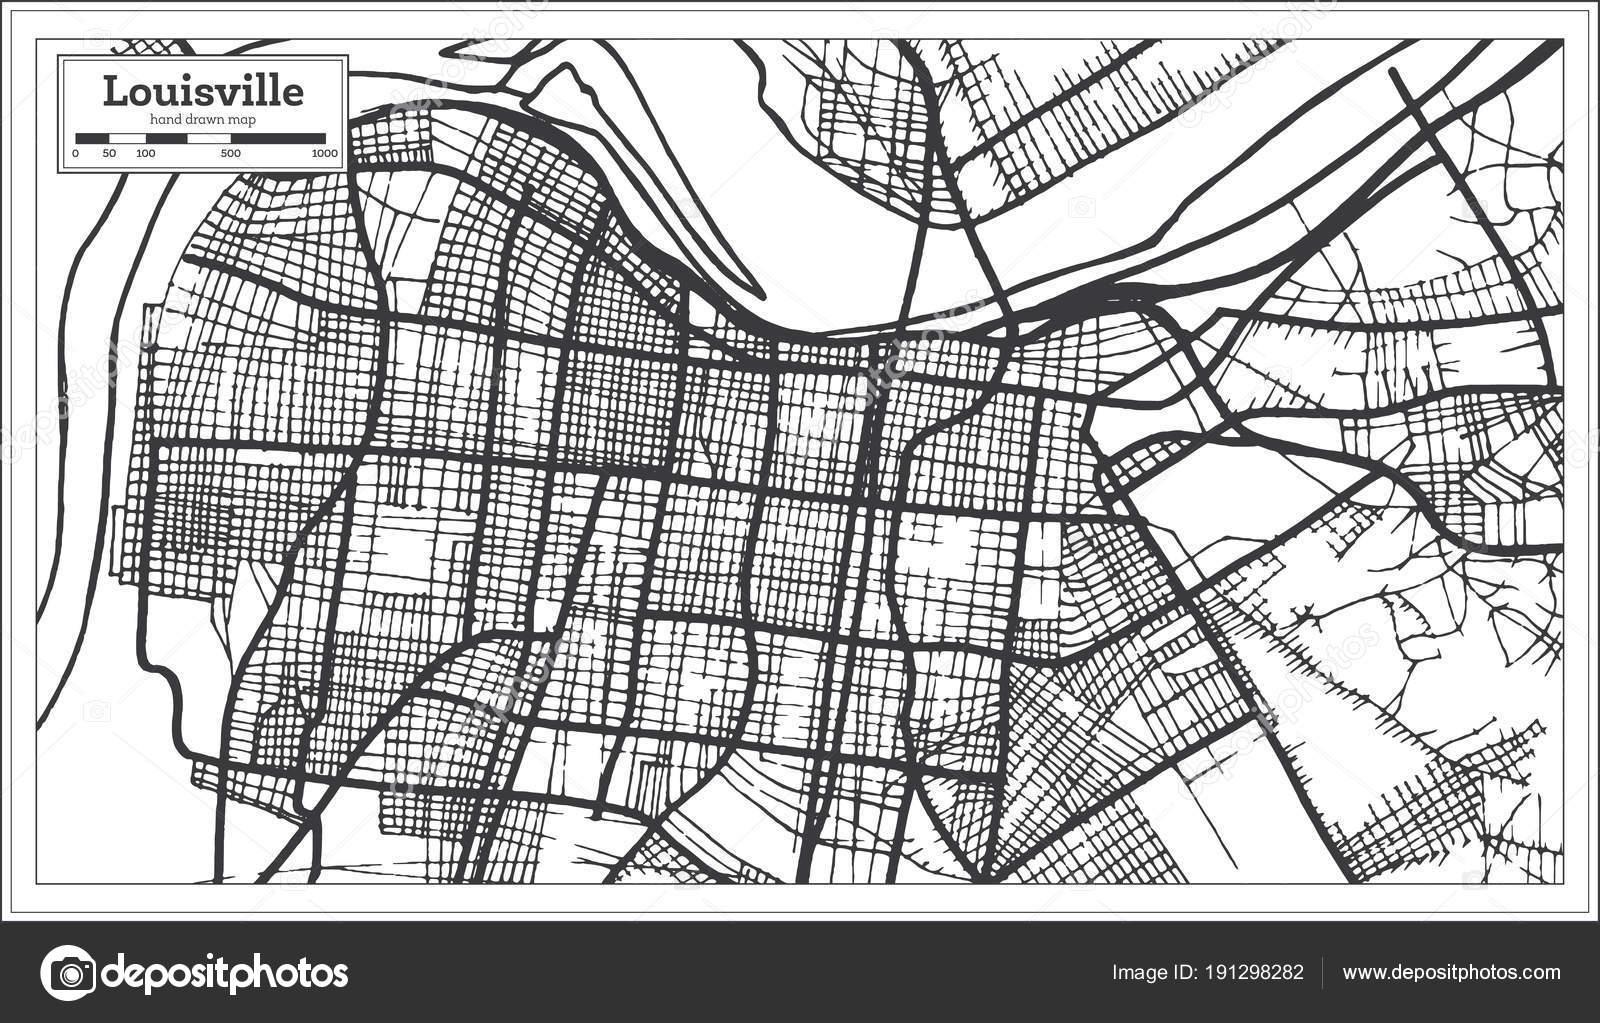 Louisville Kentucky USA City Map in Retro Style. Outline Map ... on s carolina city map, tennessee city map, pontotoc city map, washington d.c. city map, rockingham county city map, bonita city map, lawrenceburg city map, kentucky ashland ky, georgia city map, massachusetts city map, johnson county city map, pikeville city map, bay st. louis city map, levy county city map, alvin city map, new roads city map, indiana city map, louisiana city map, park city city map, western north carolina city map,